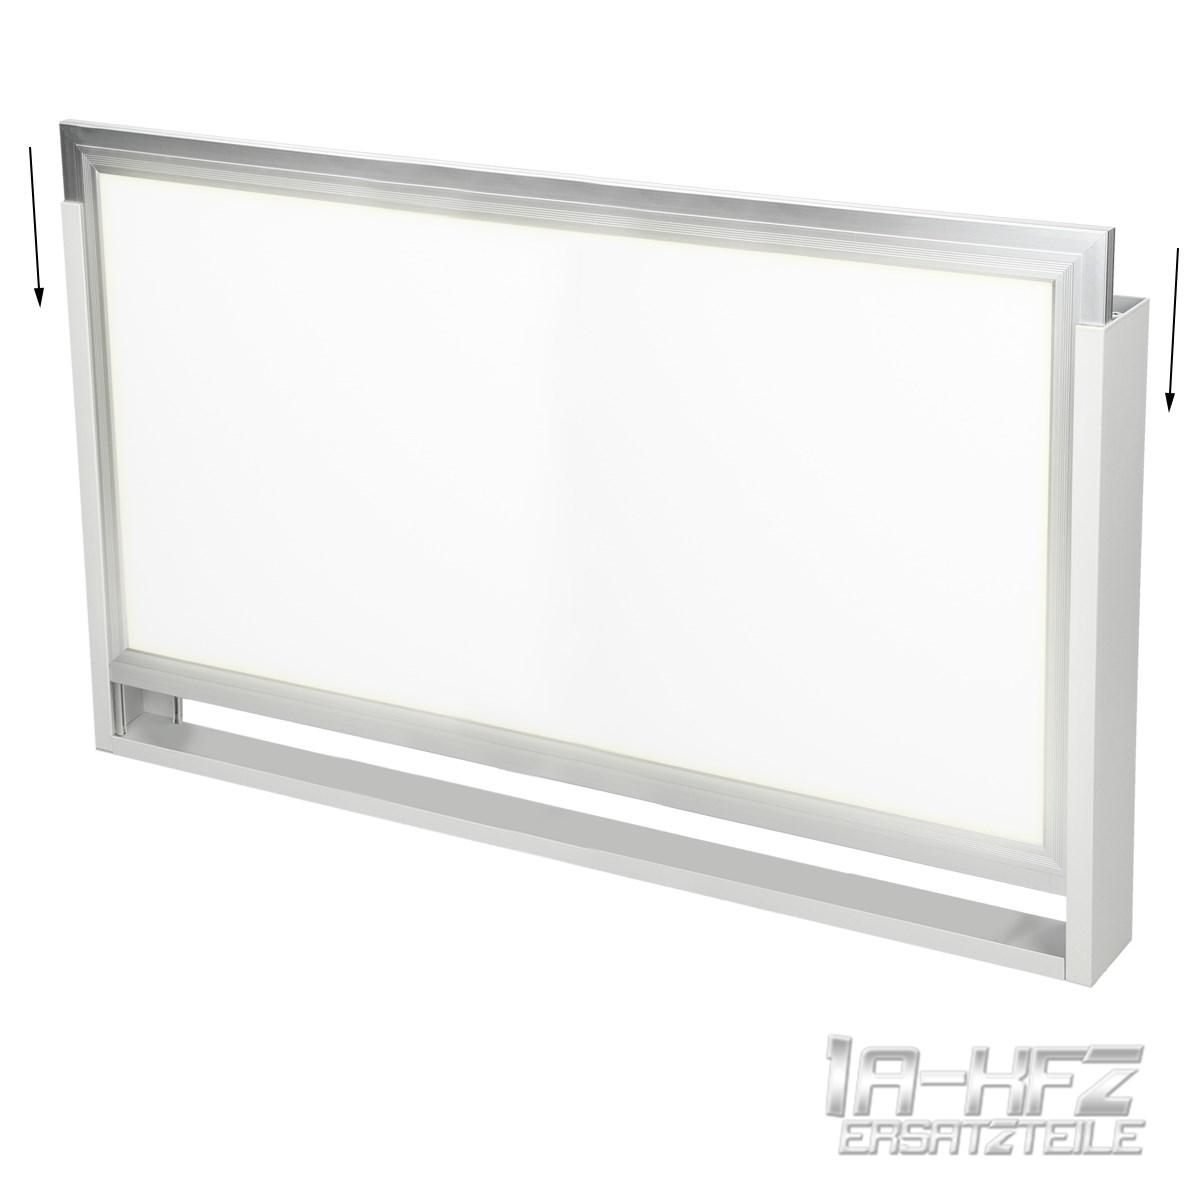 led panel rahmen deckenaufbau 60x30 cm alurahmen montageset deckenmontage wand ebay